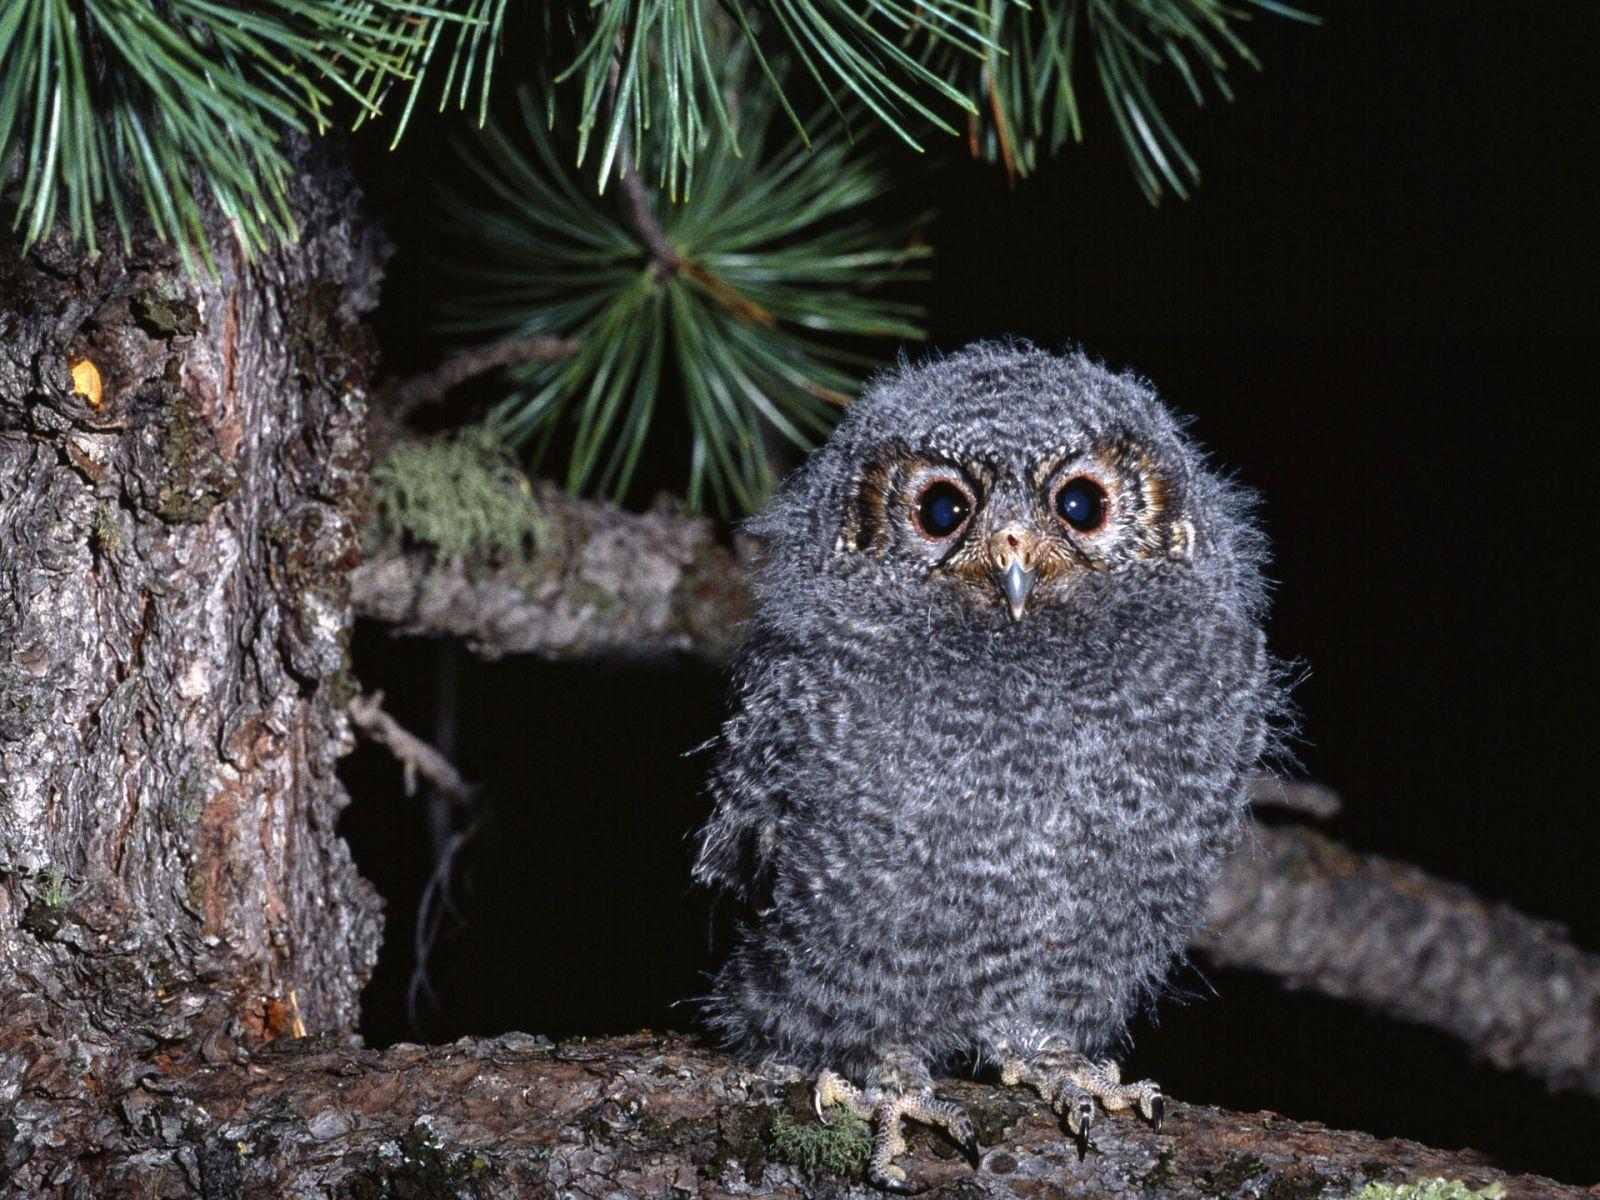 Small Furry Owl Portrait Wallpaper 1600x1200